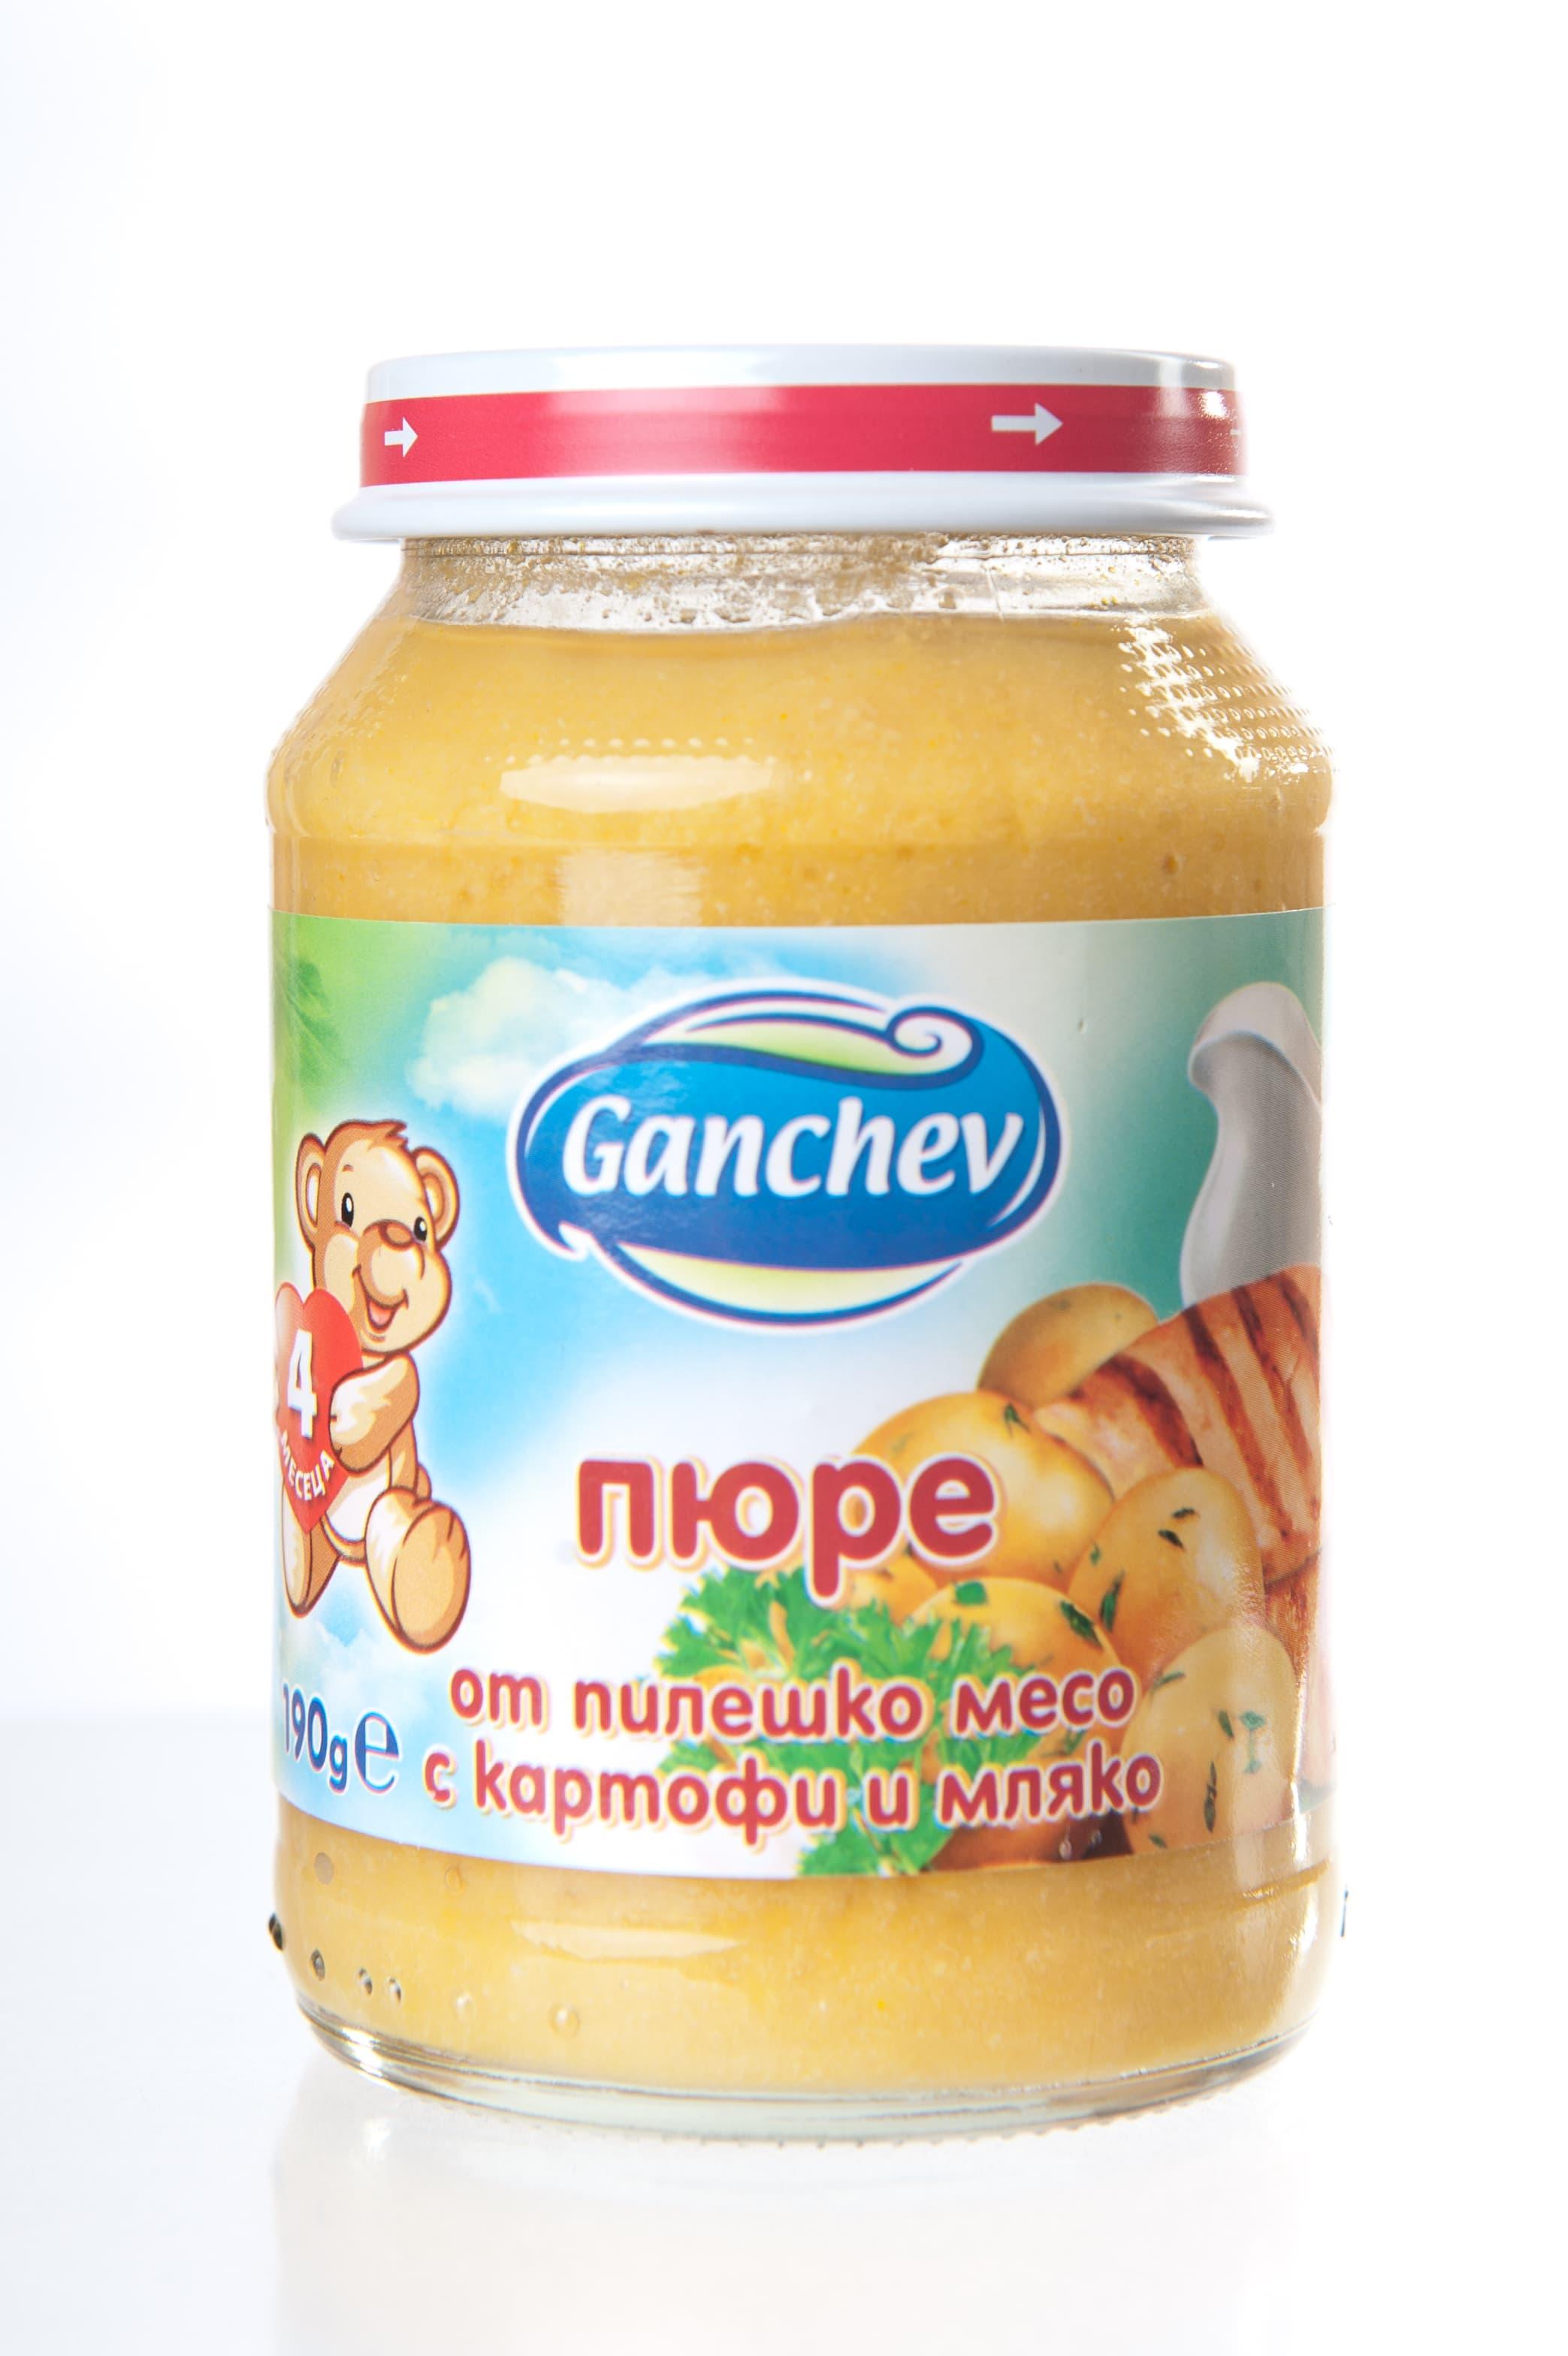 Ganchev-пюре от пилешко месо с картофи и мляко 4м+ 190гр